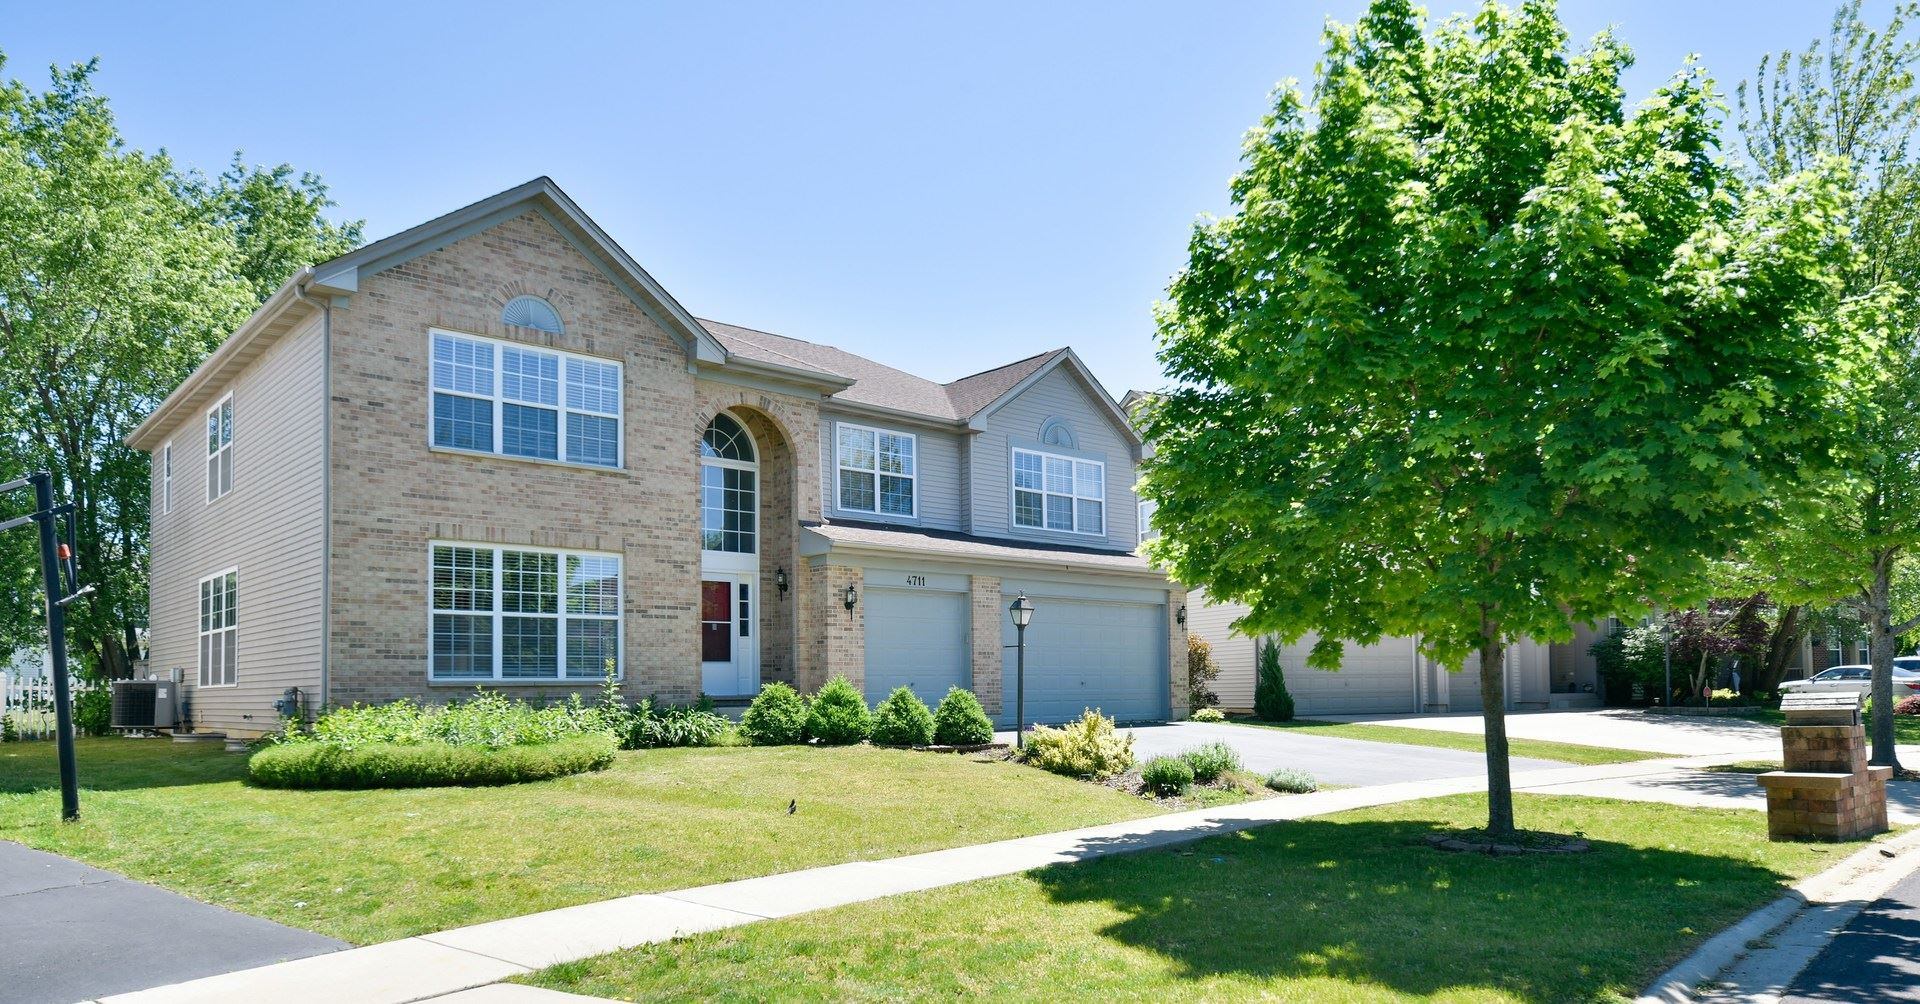 4711 Windridge Court, Carpentersville, IL 60110 - #: 11105704